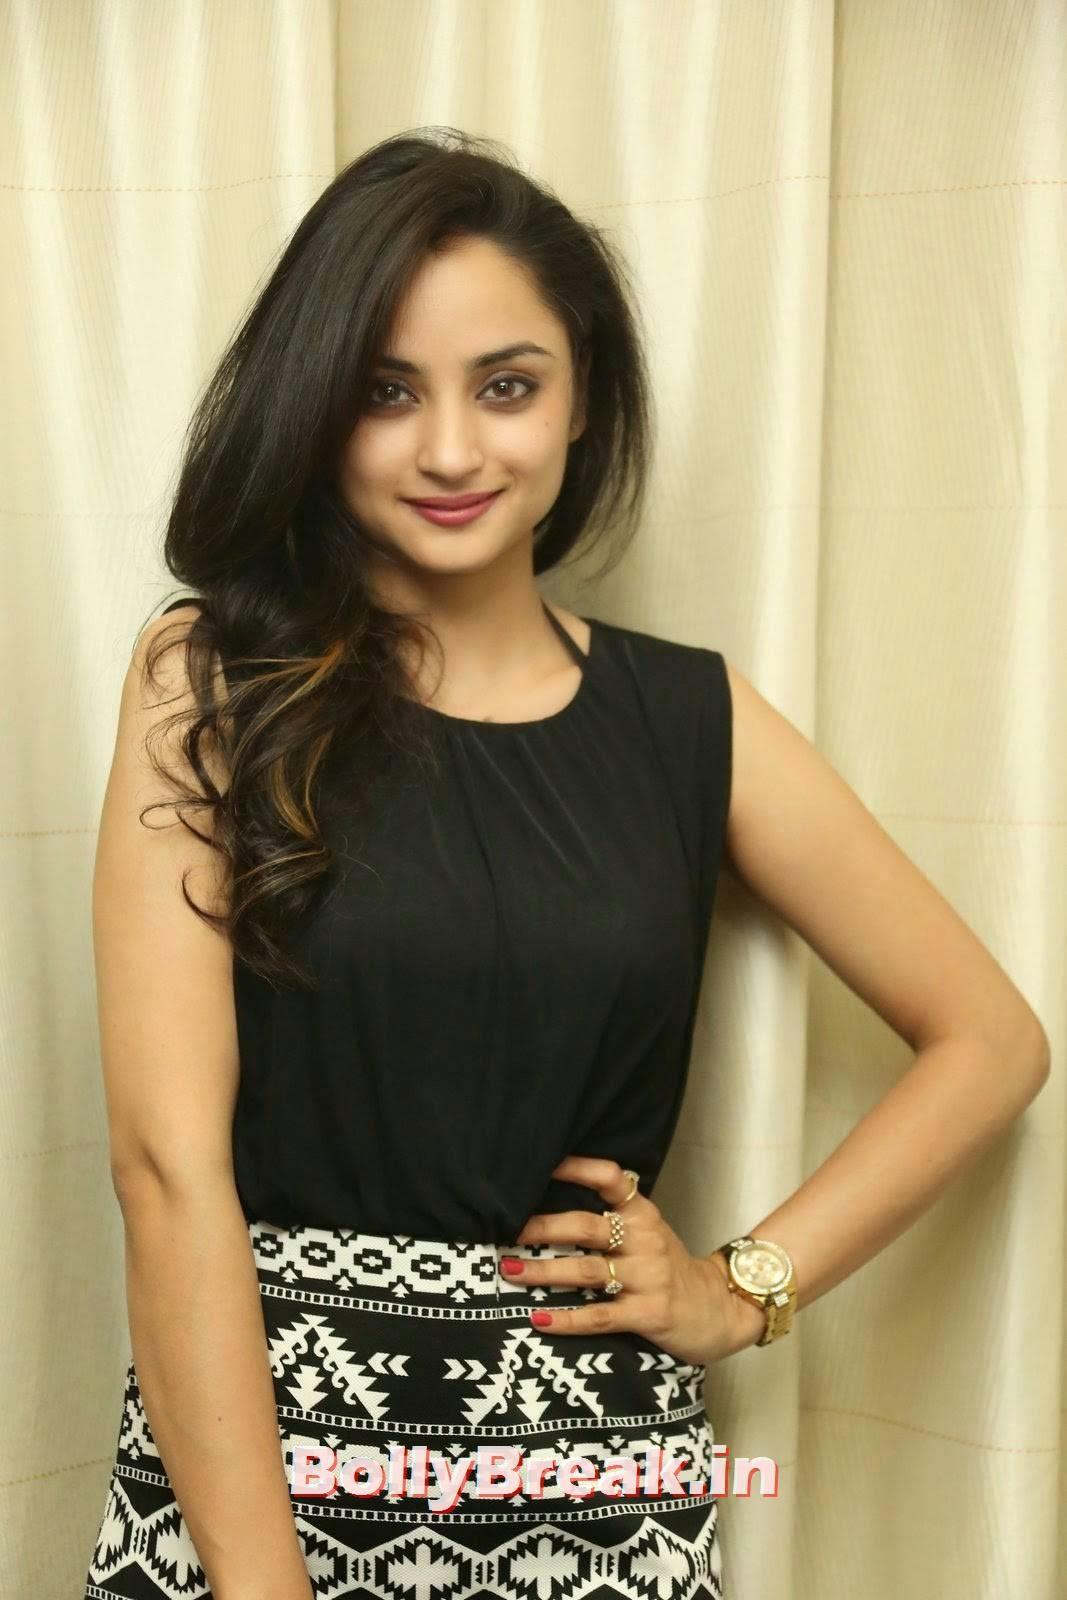 Madirakshi Stills, Actress Madirakshi Hot Pics in Skirt & Black Top